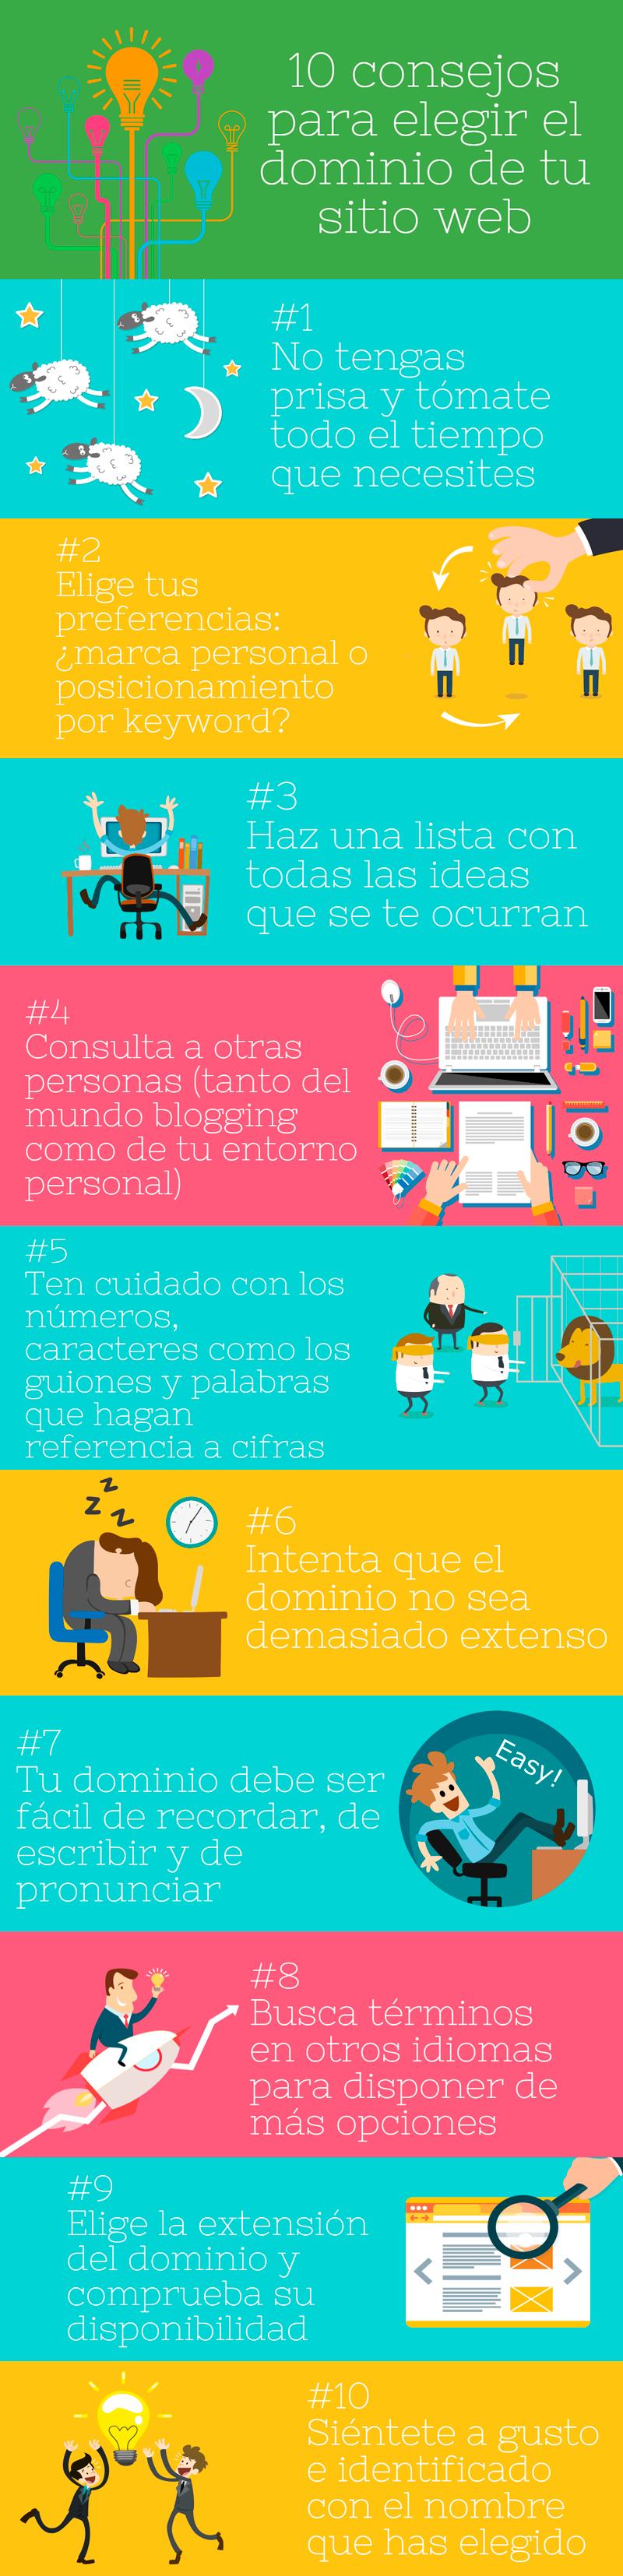 Infografia_consejos_para_elegir_dominio